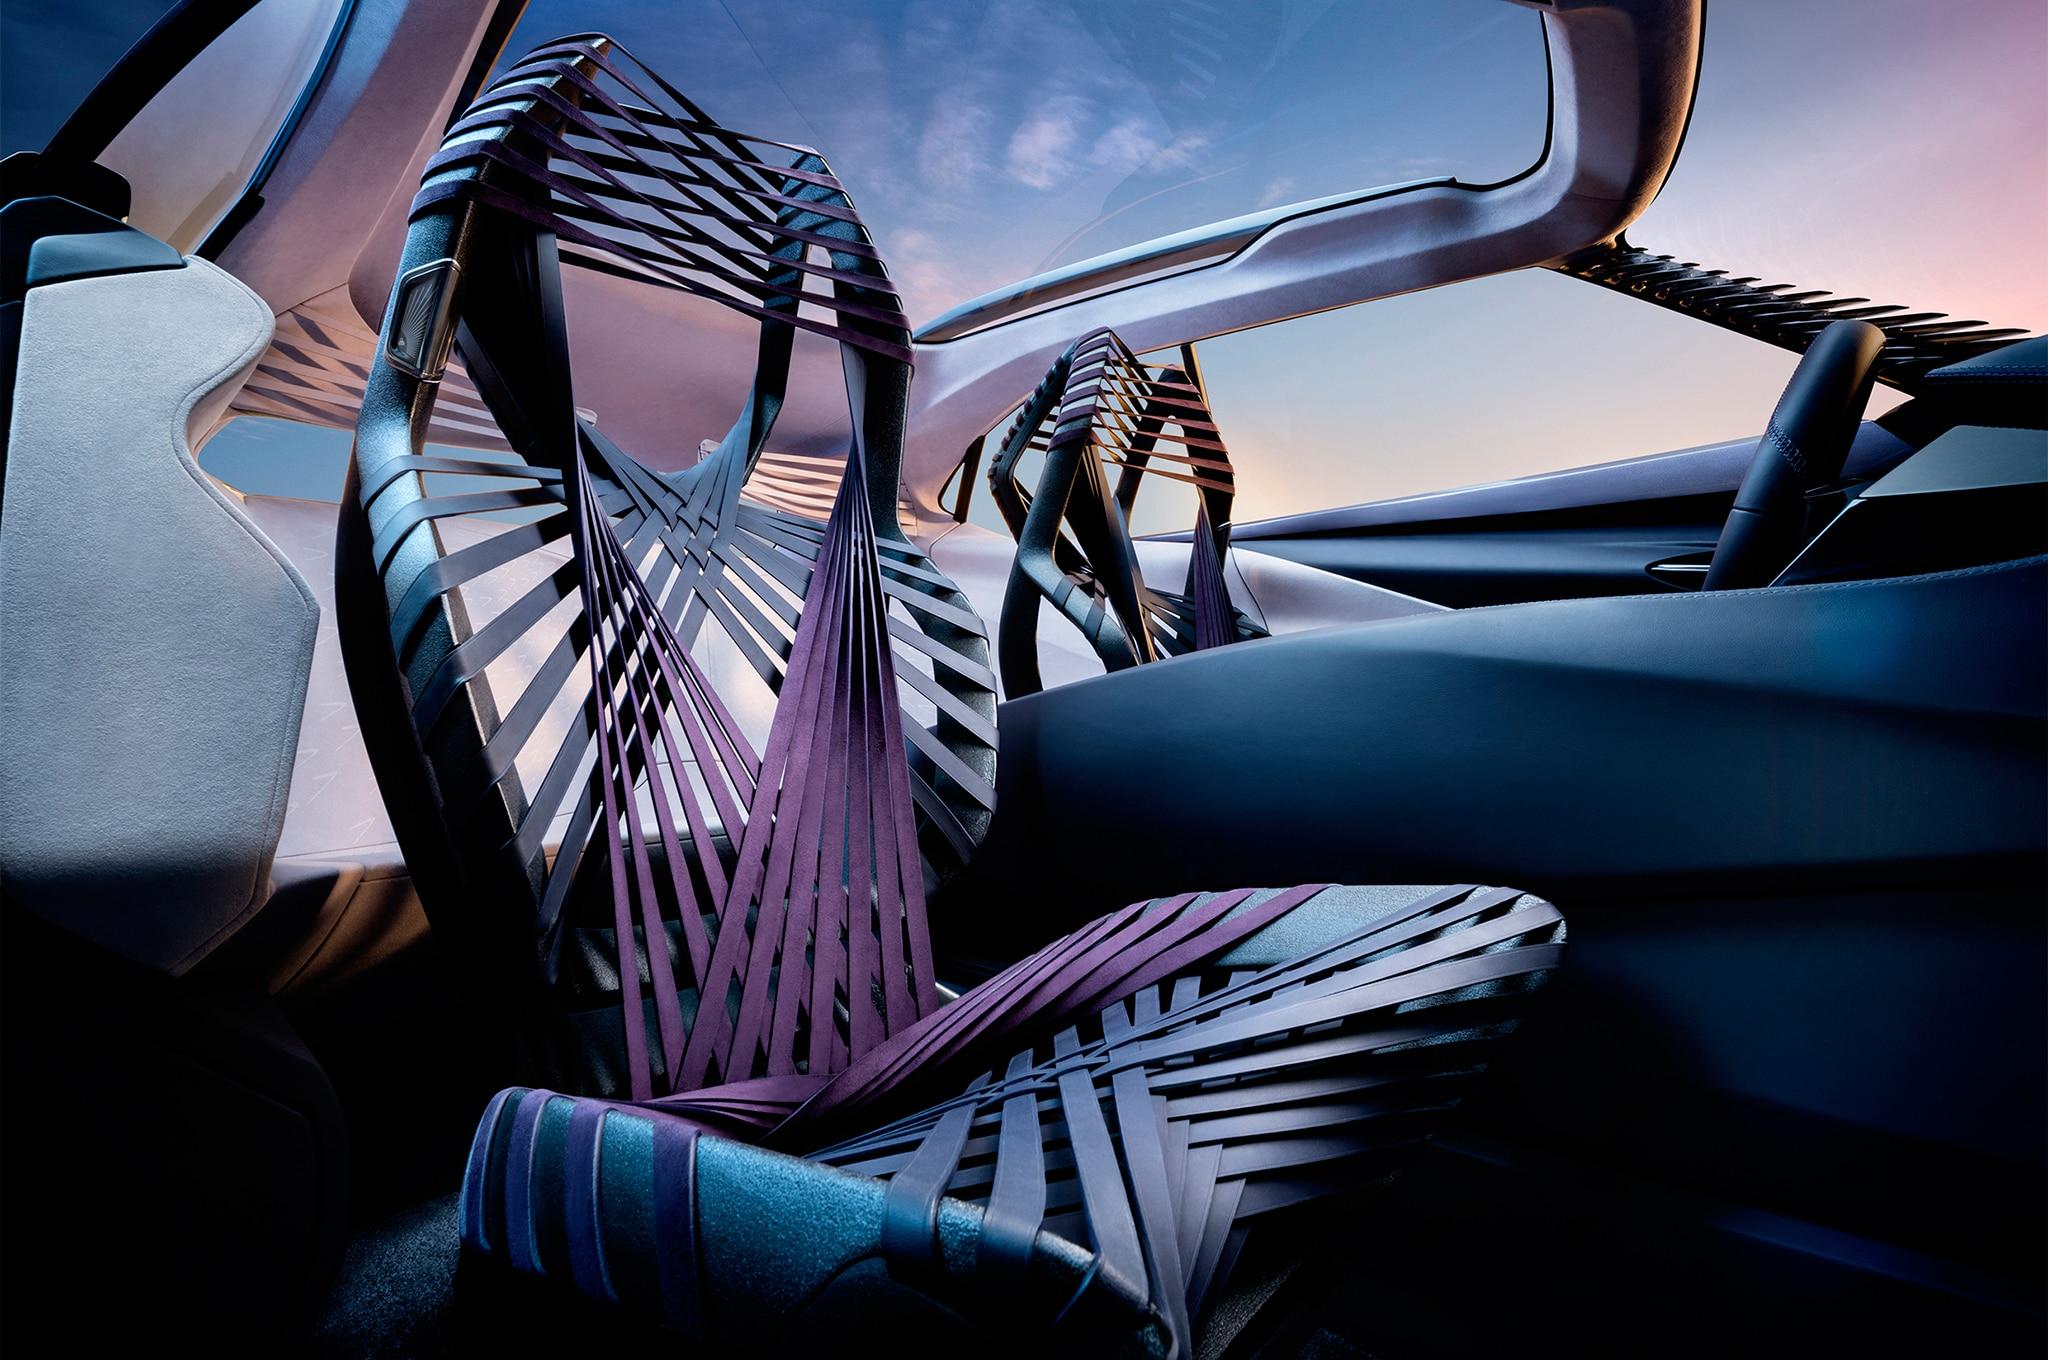 https://st.automobilemag.com/uploads/sites/11/2016/09/Lexus-UX-Concept-interior-seats.jpg